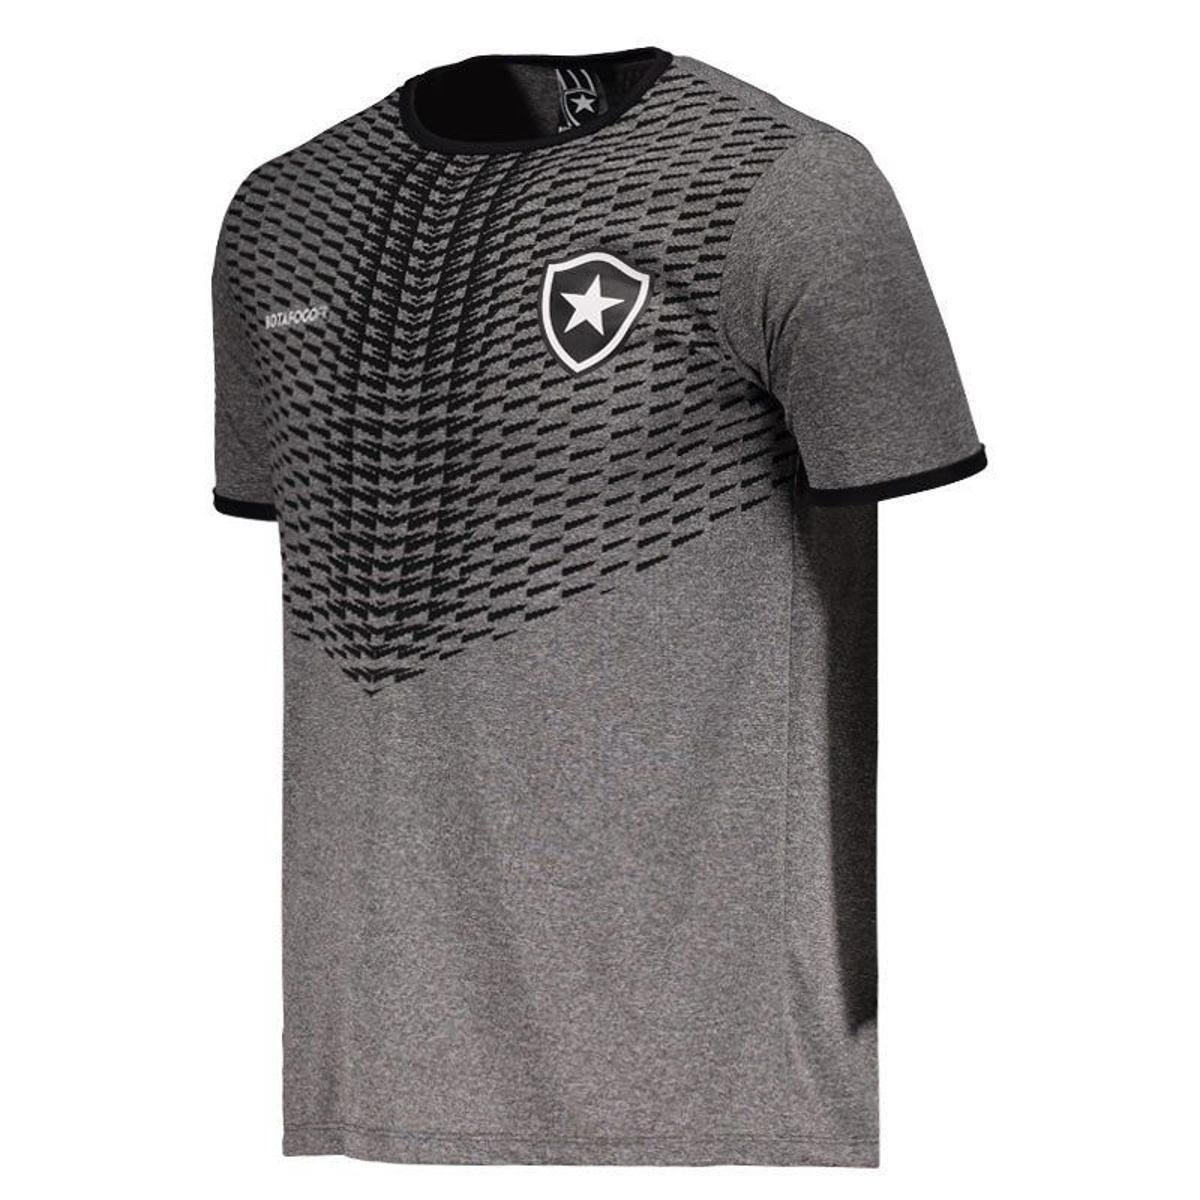 Camisa Botafogo Blitz Masculina  Camisa Botafogo Blitz Masculina ... fd53a902cda3c